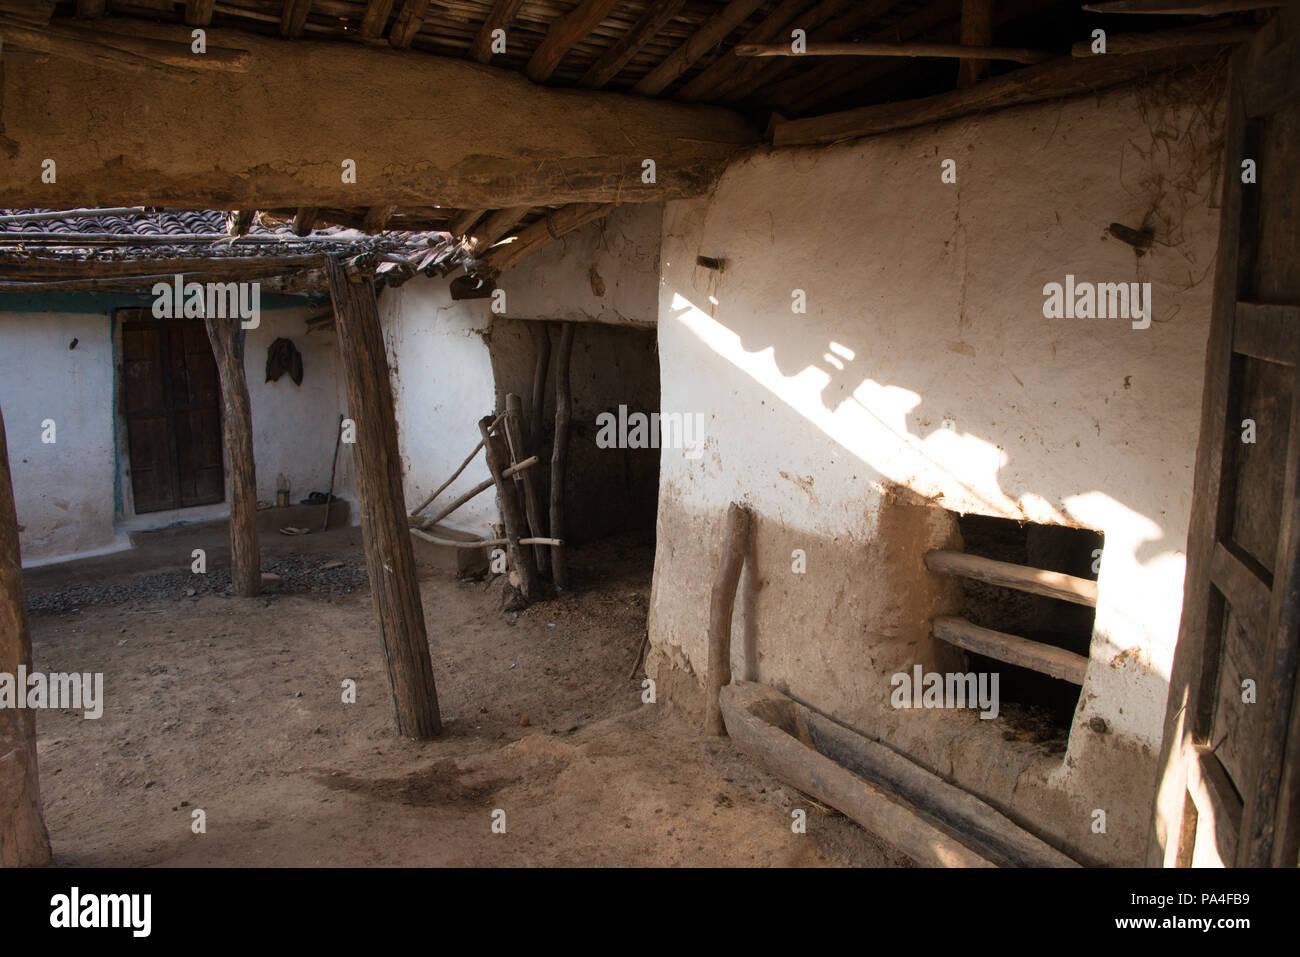 An old dwelling house in Kanha village , Kanha National Park, India Stock Photo